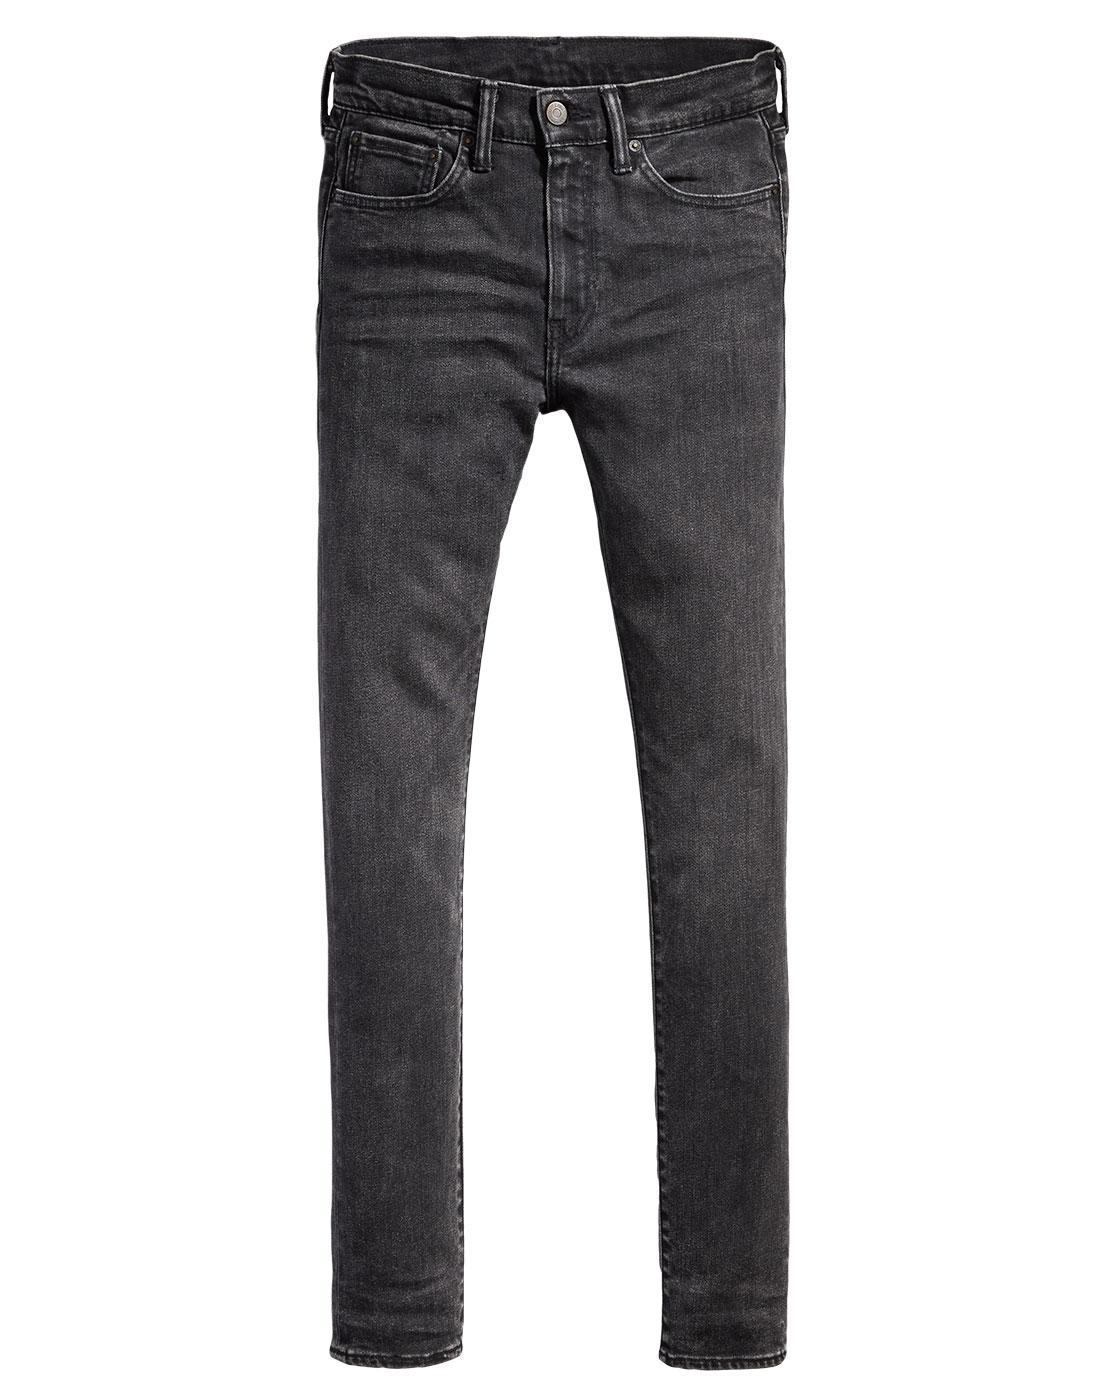 LEVI'S 519 Retro Mod Extreme Skinny Jeans BASEMENT